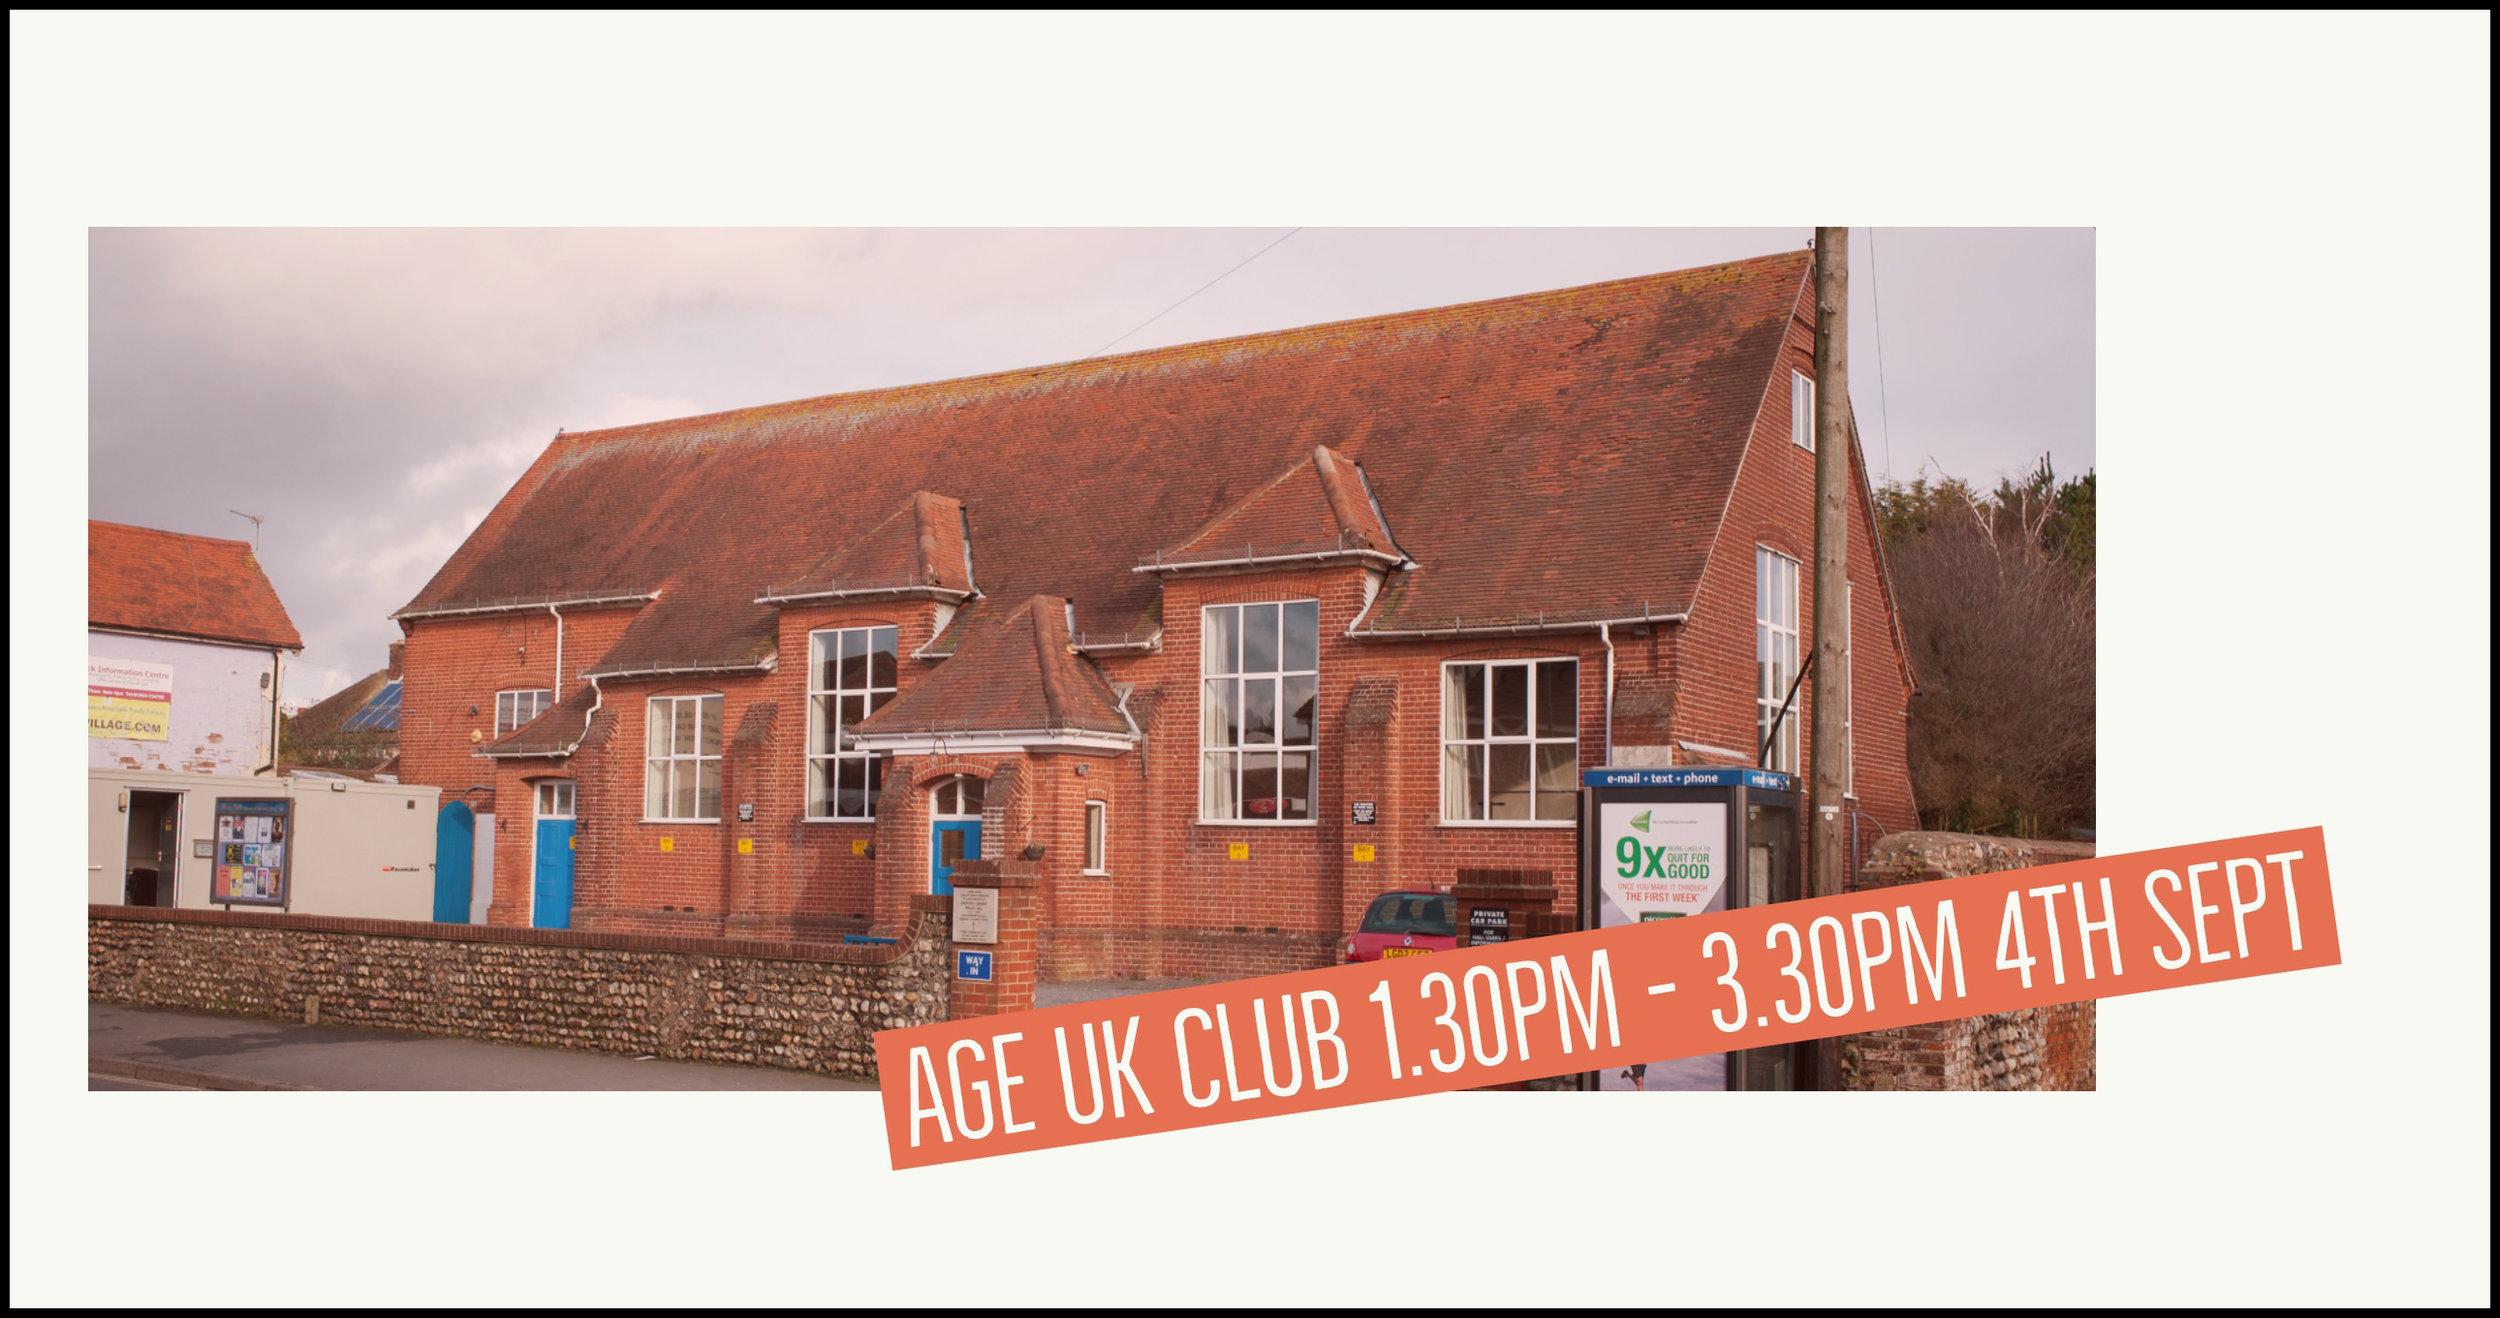 Age UK Club Wick Village Hall Littlehampton